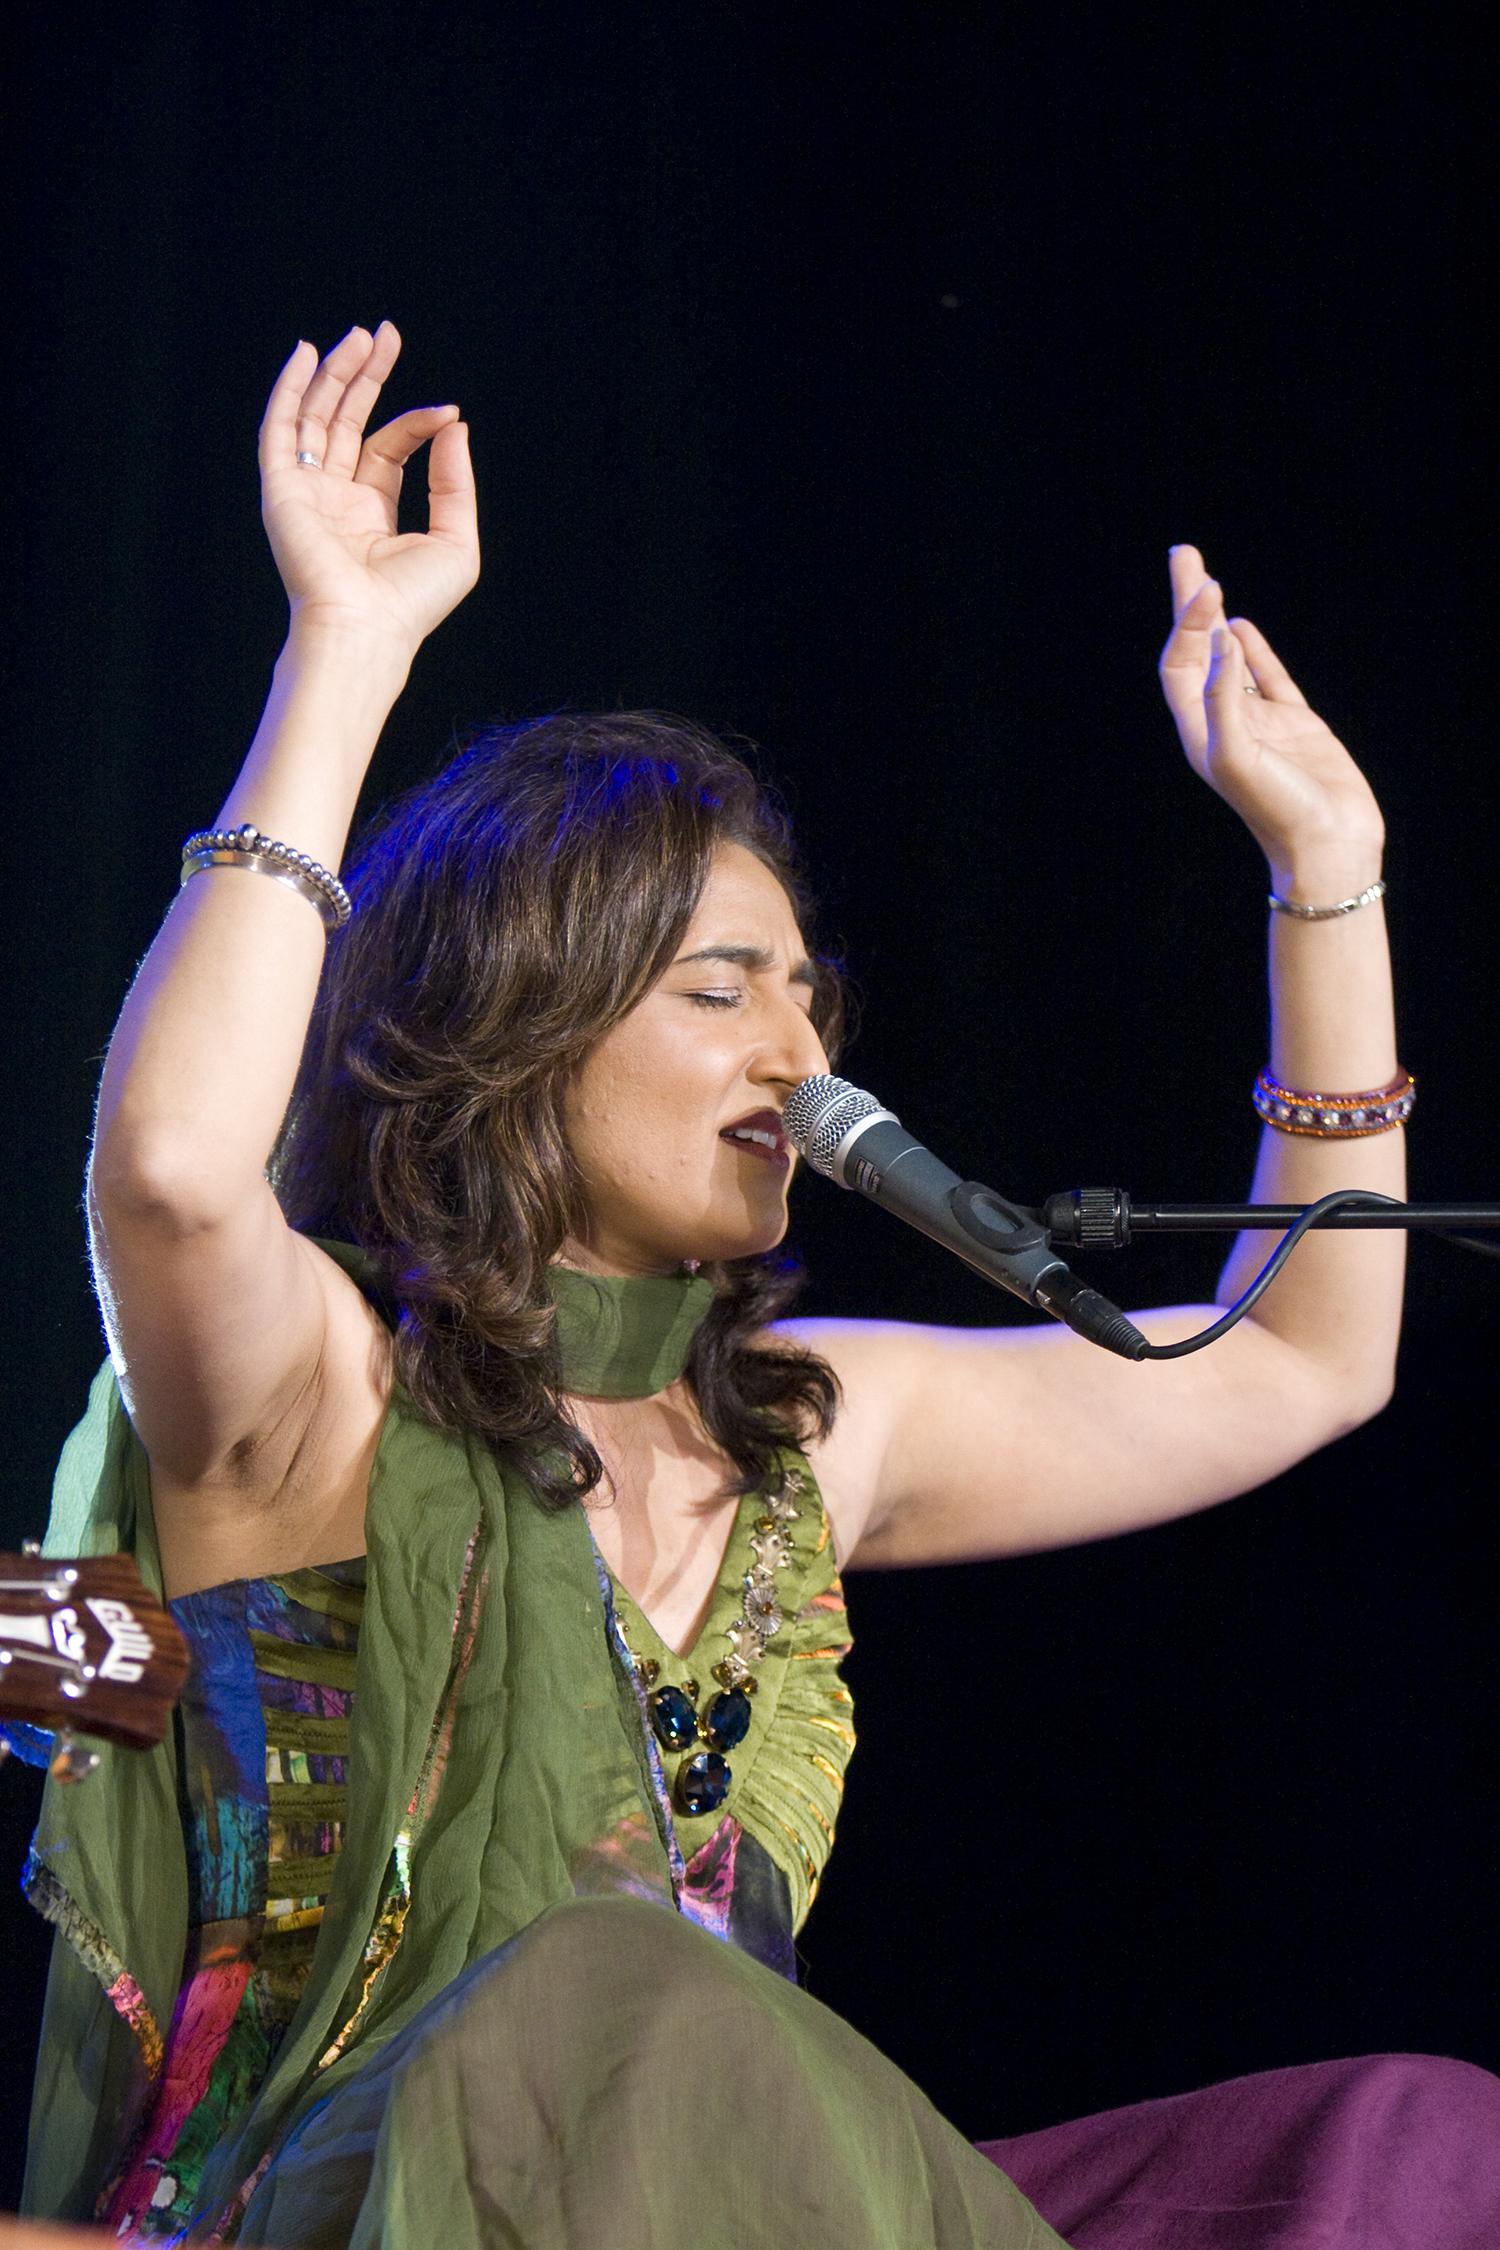 Kiran Ahulawalia, Paléo festival, 2009